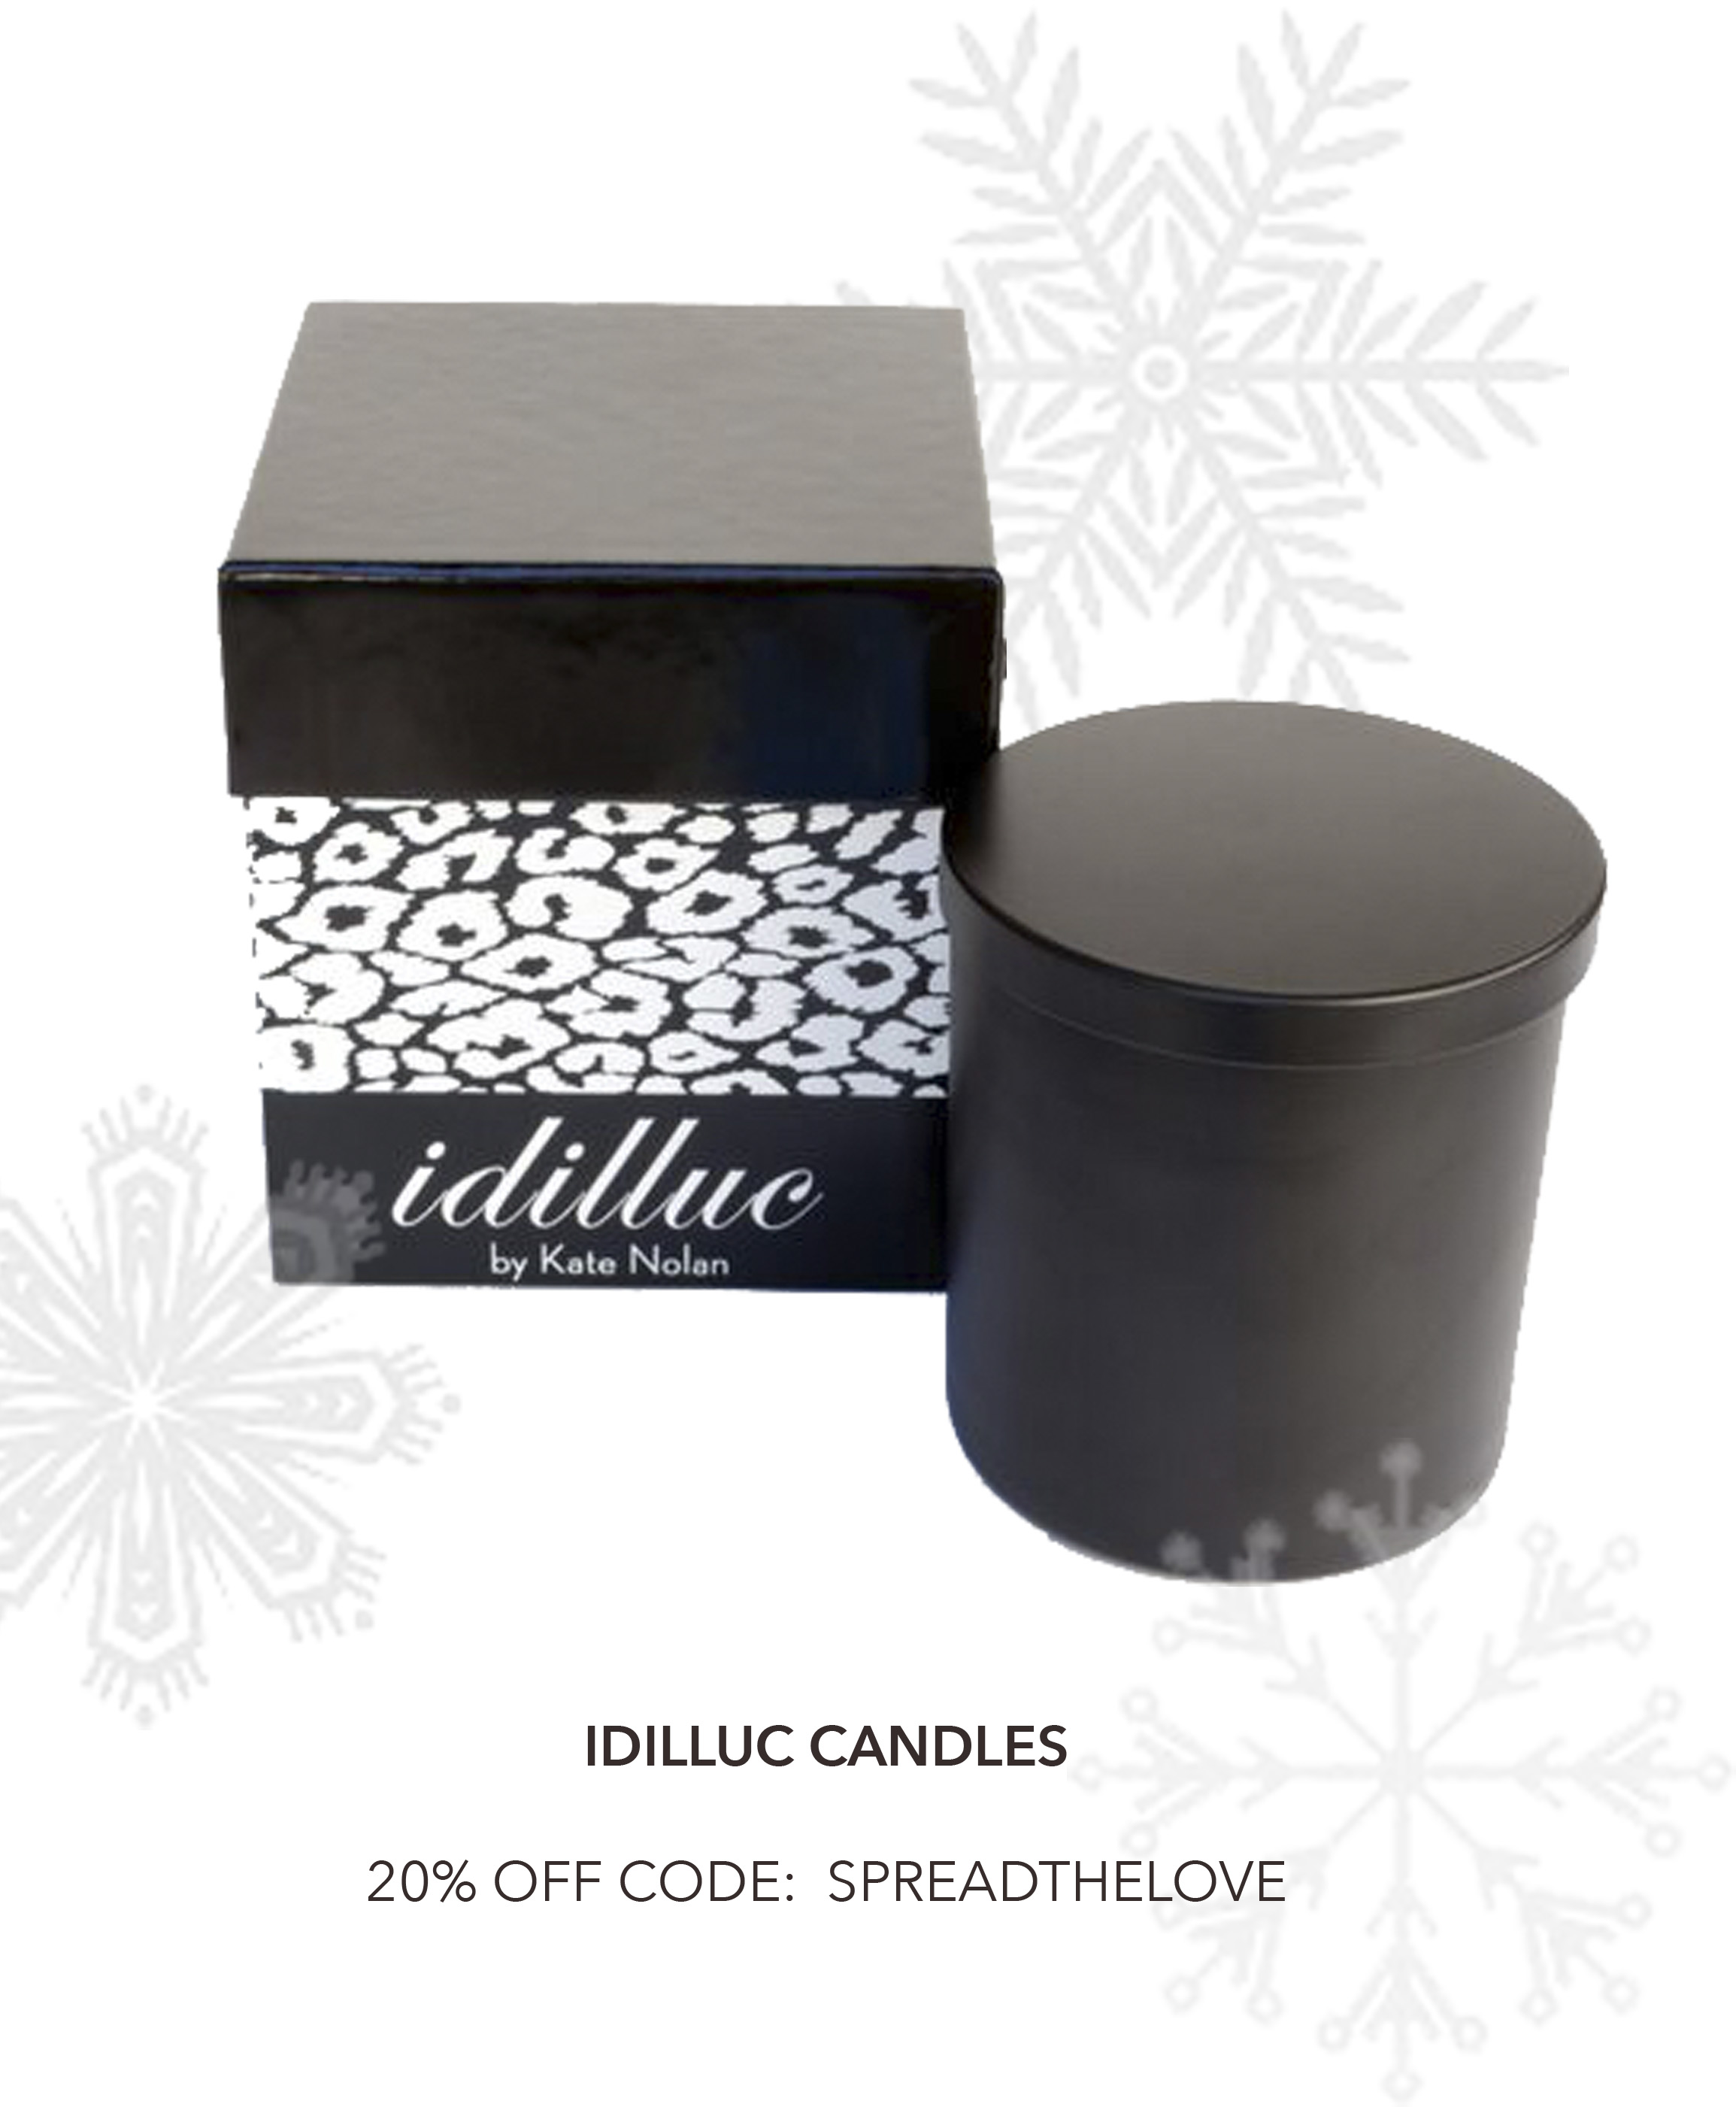 Idilluc candle sale.jpg